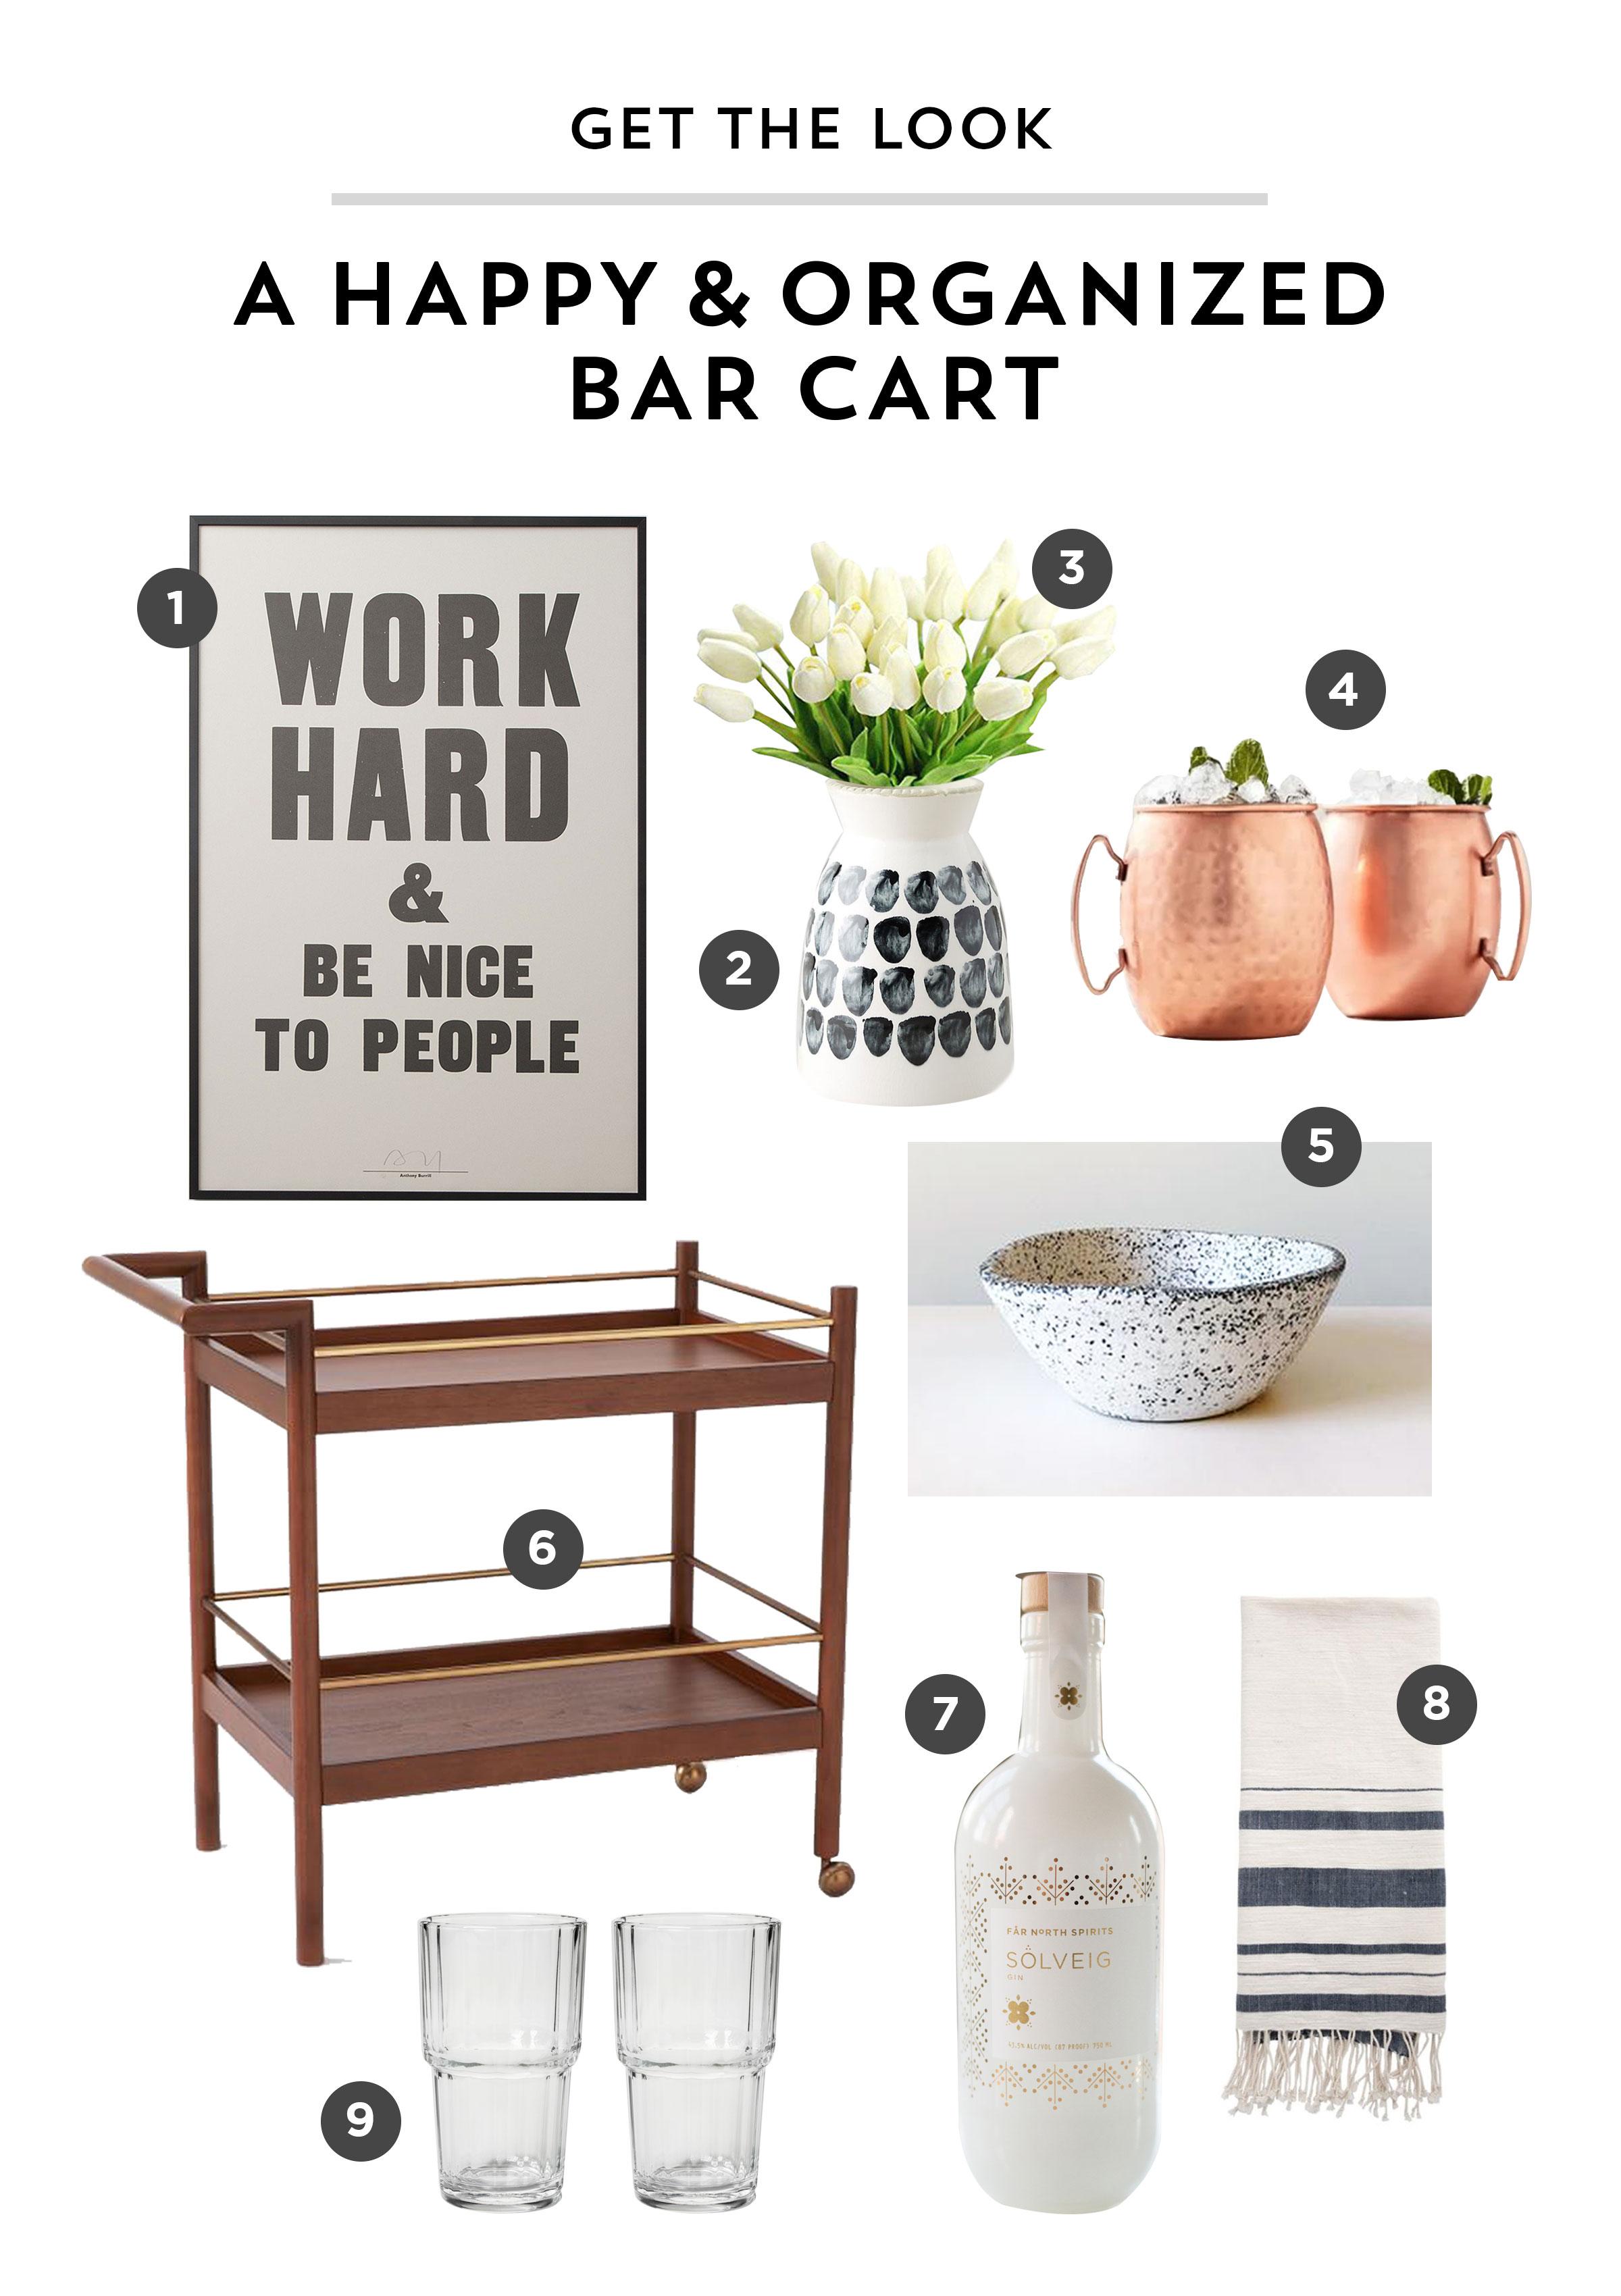 bar-cart-get-the-look.jpg